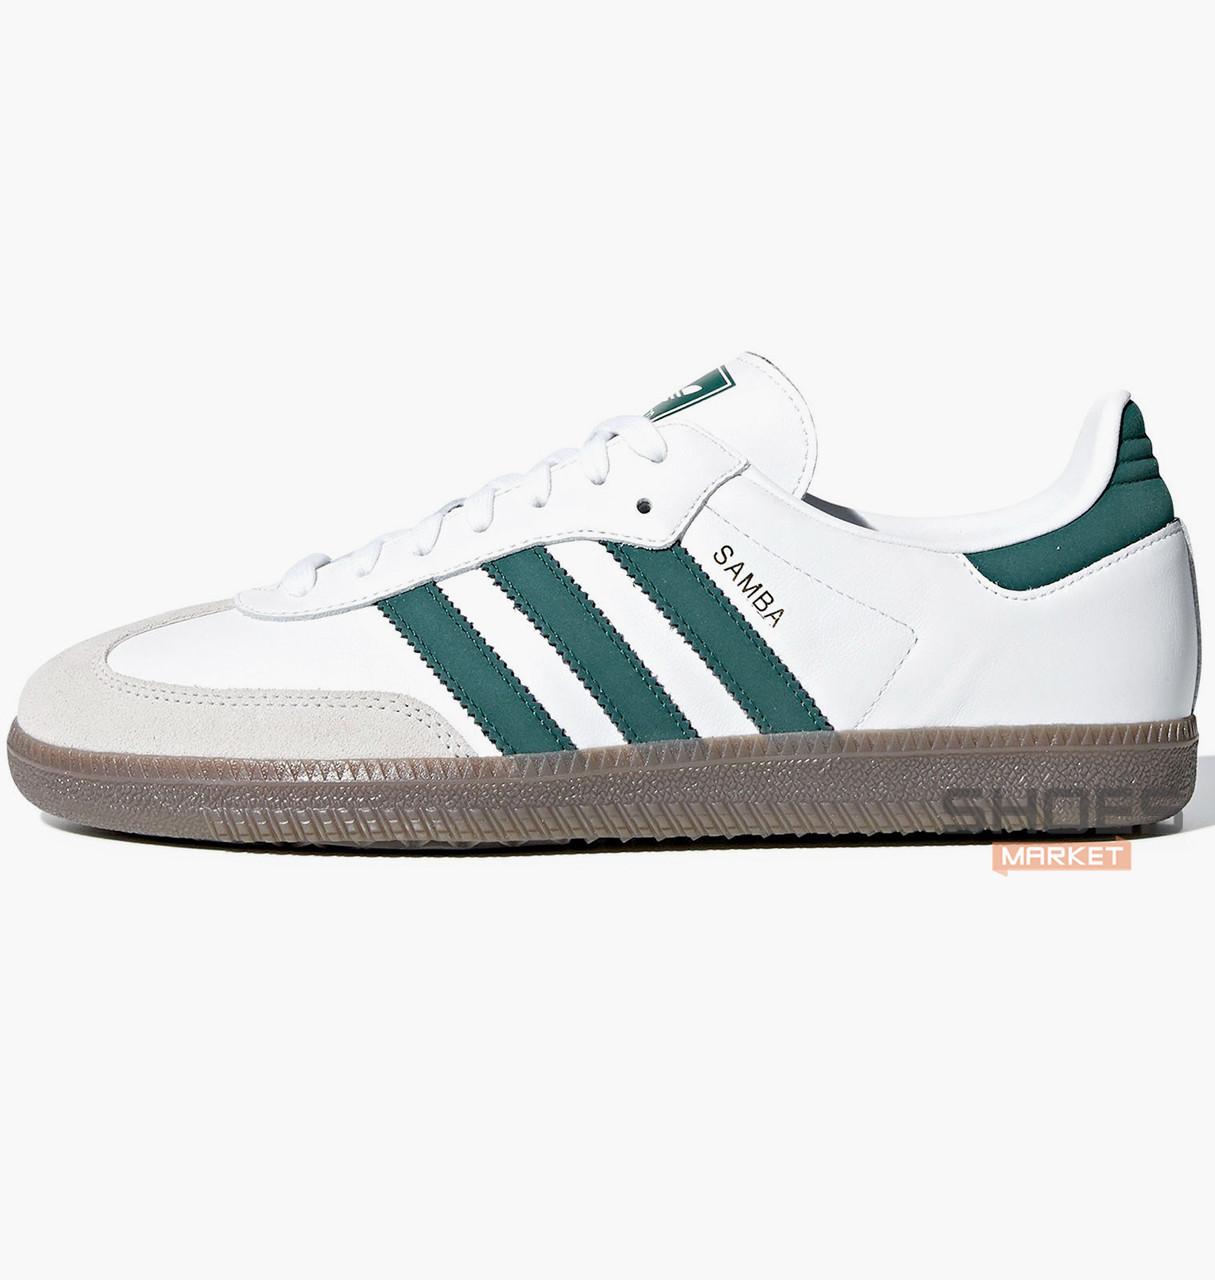 Мужские кроссовки Adidas Samba OG B75680 White/Green, оригинал